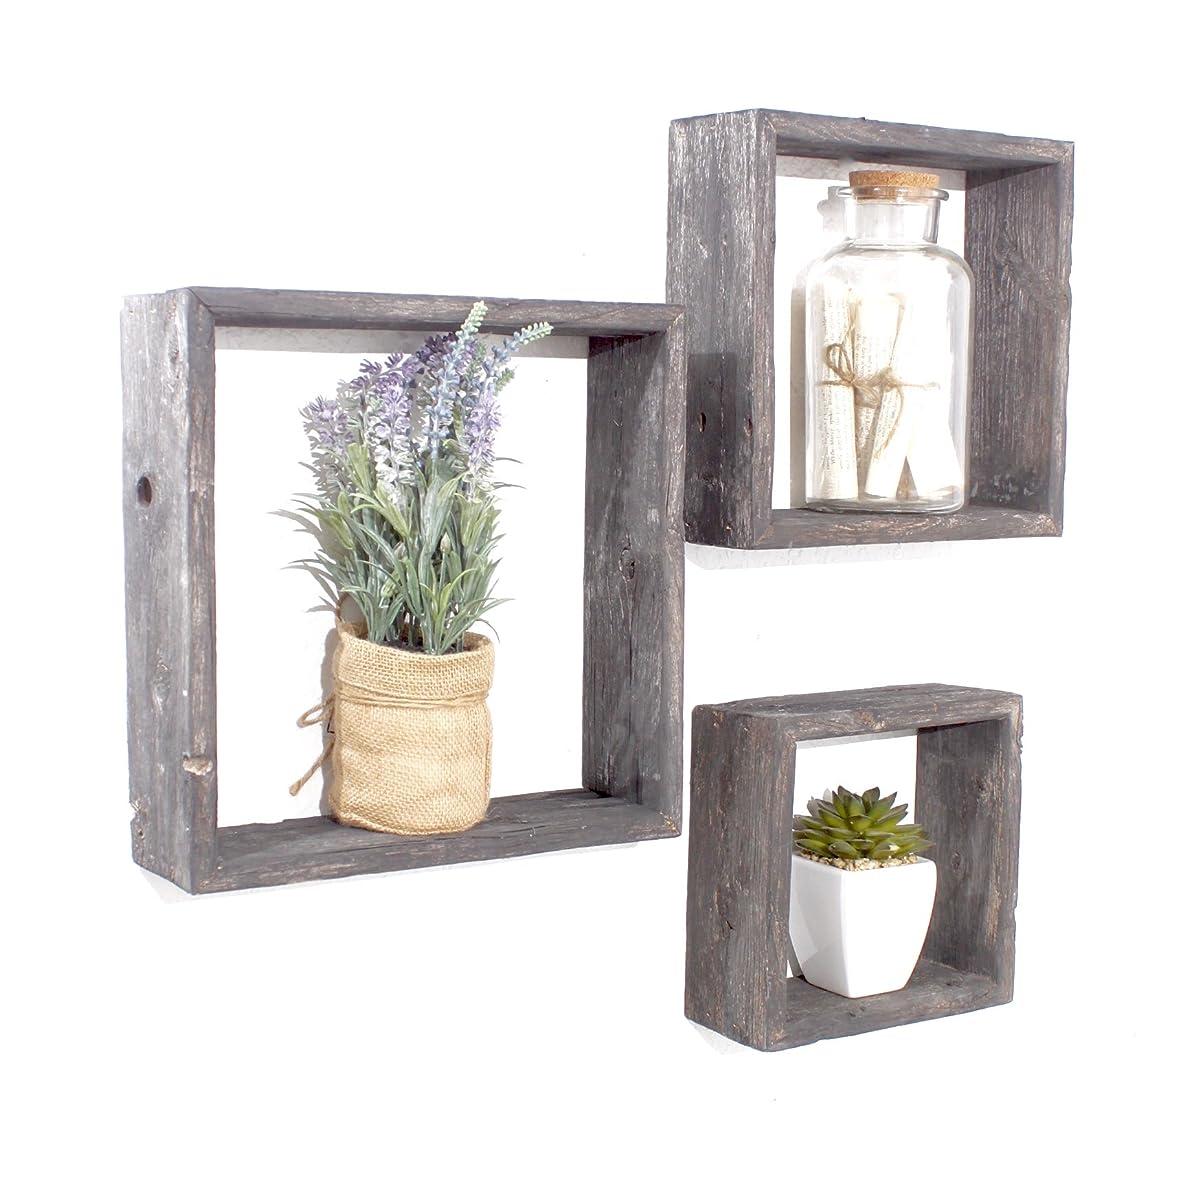 BarnwoodUSA Reclaimed Wooden Shelves - Set of 3 (8x8, 10x10, 12x12, Smoky Black)